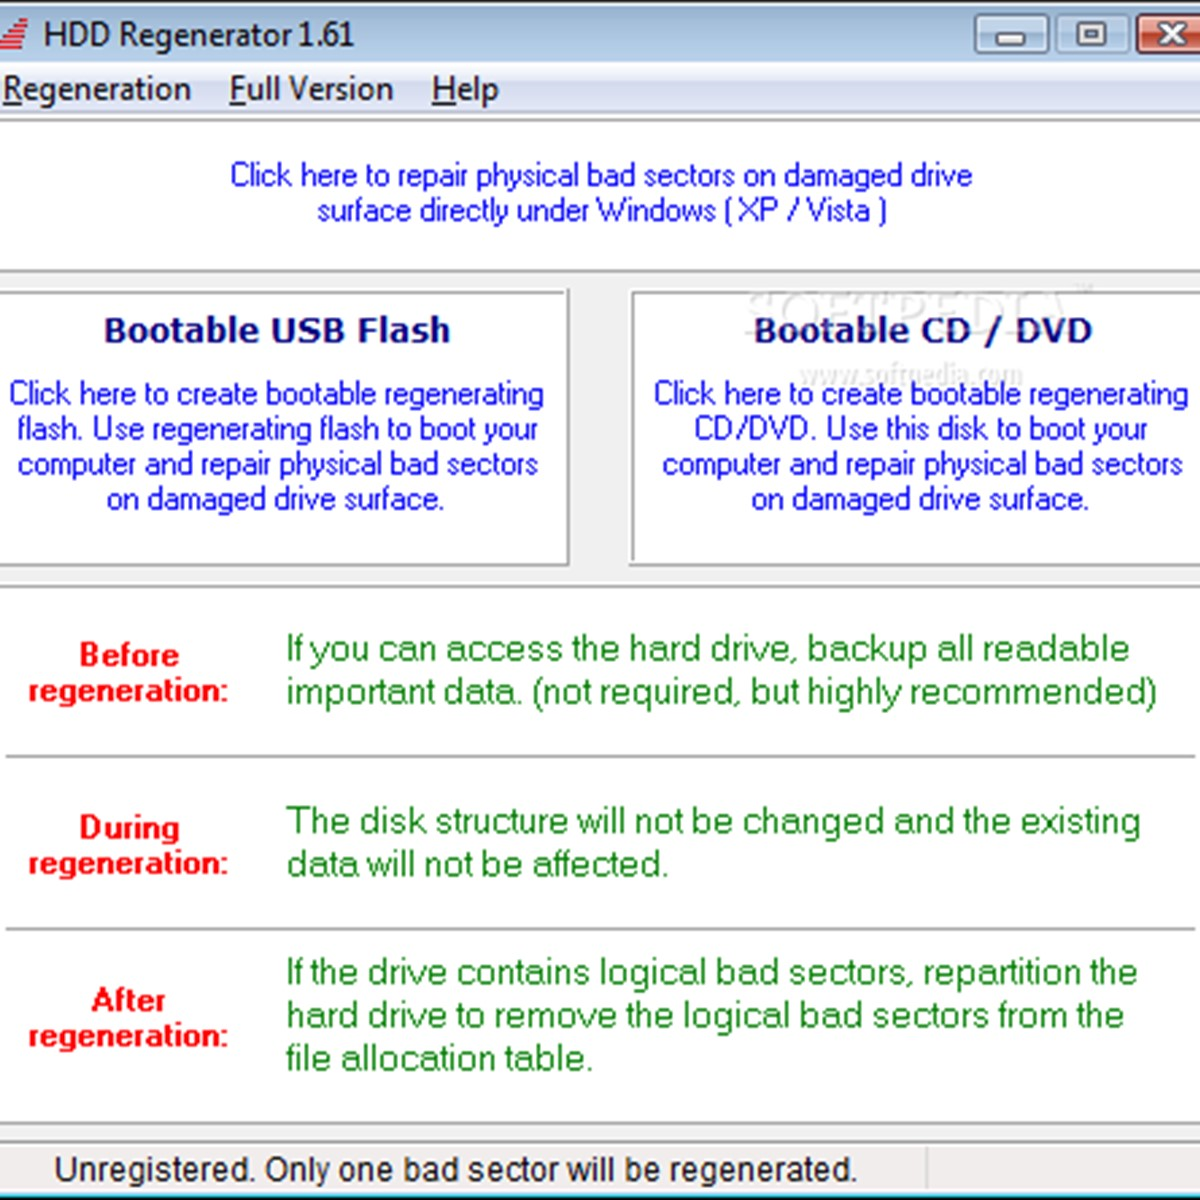 Hdd regenerator 2011 full crack free download